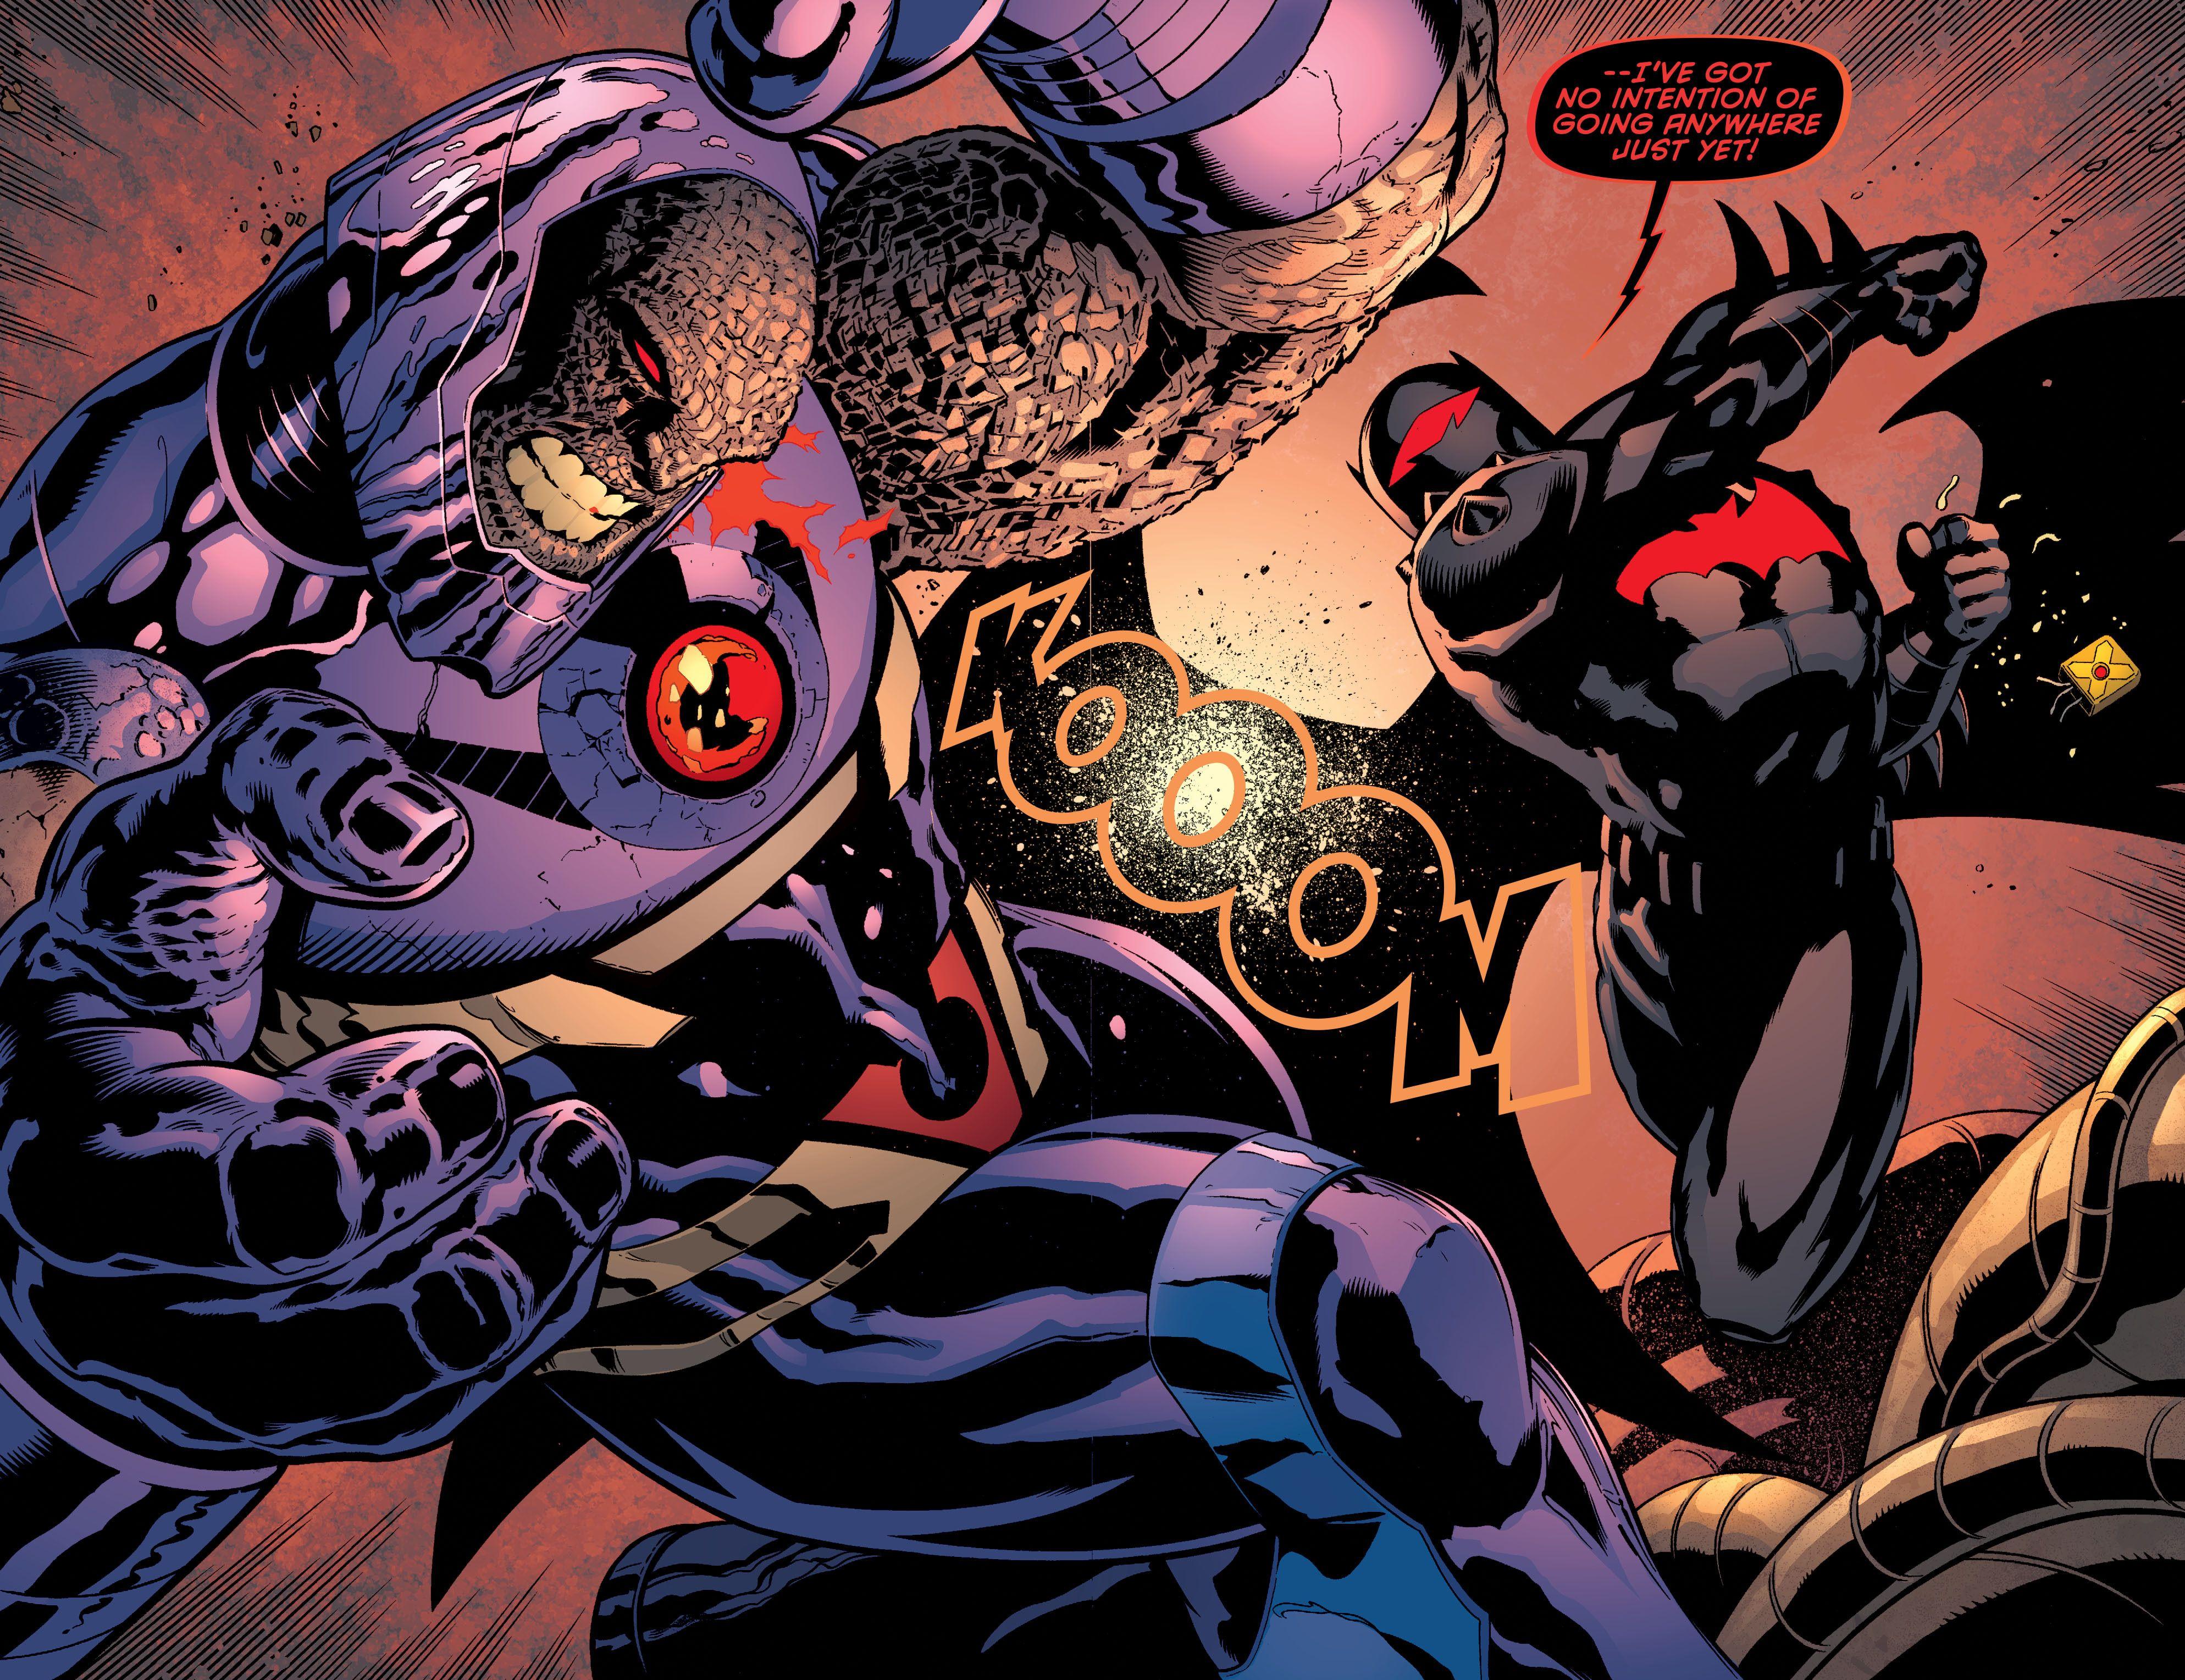 Hellbat vs. Darkseid (With images)   Darkseid